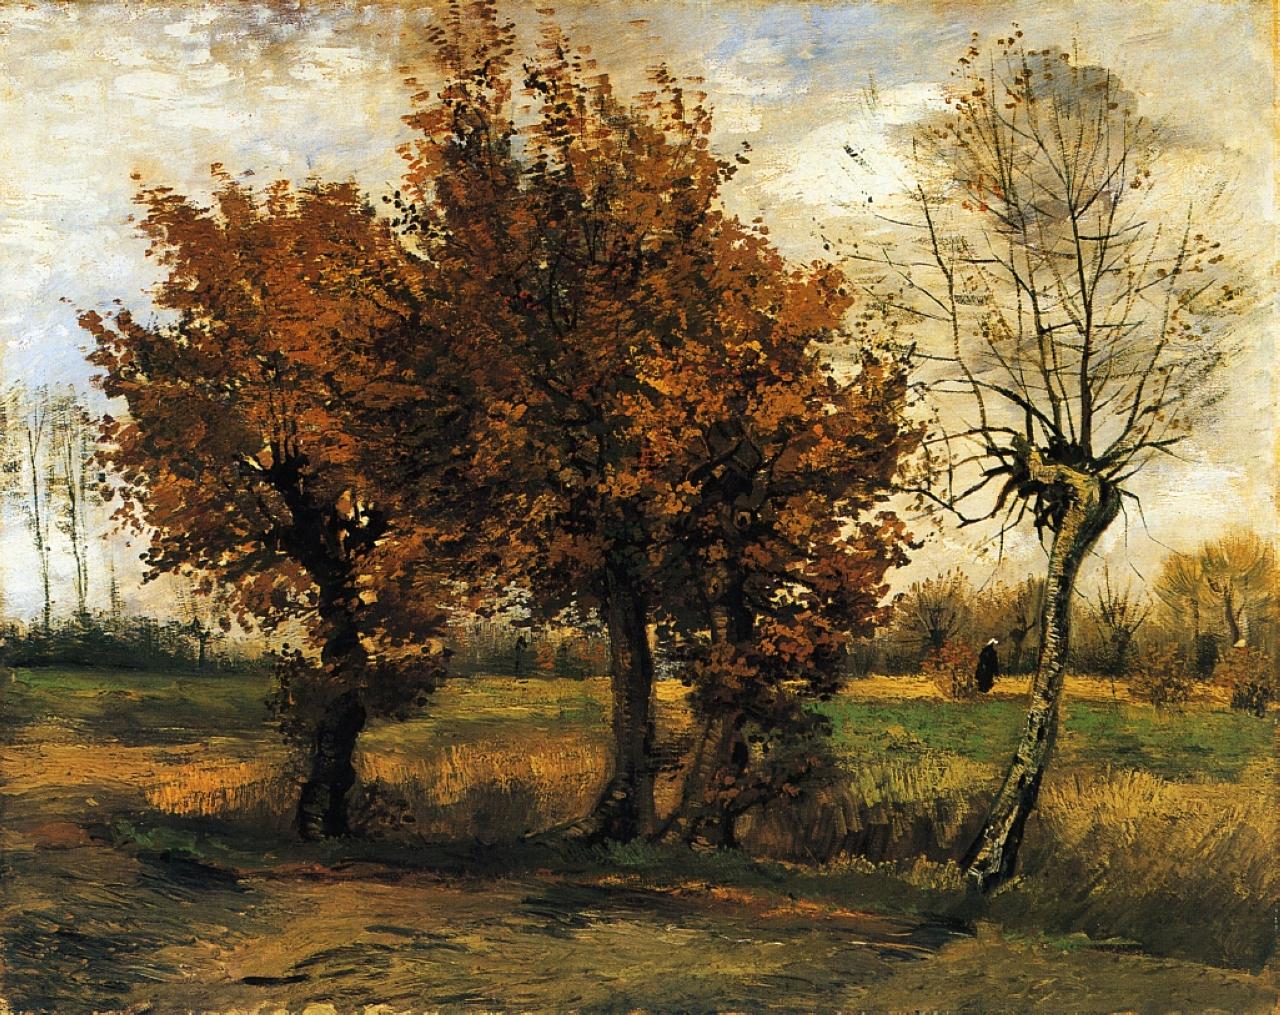 Четыре дерева, осень :: Ван Гог - Van Gogh (Ван Гог) фото